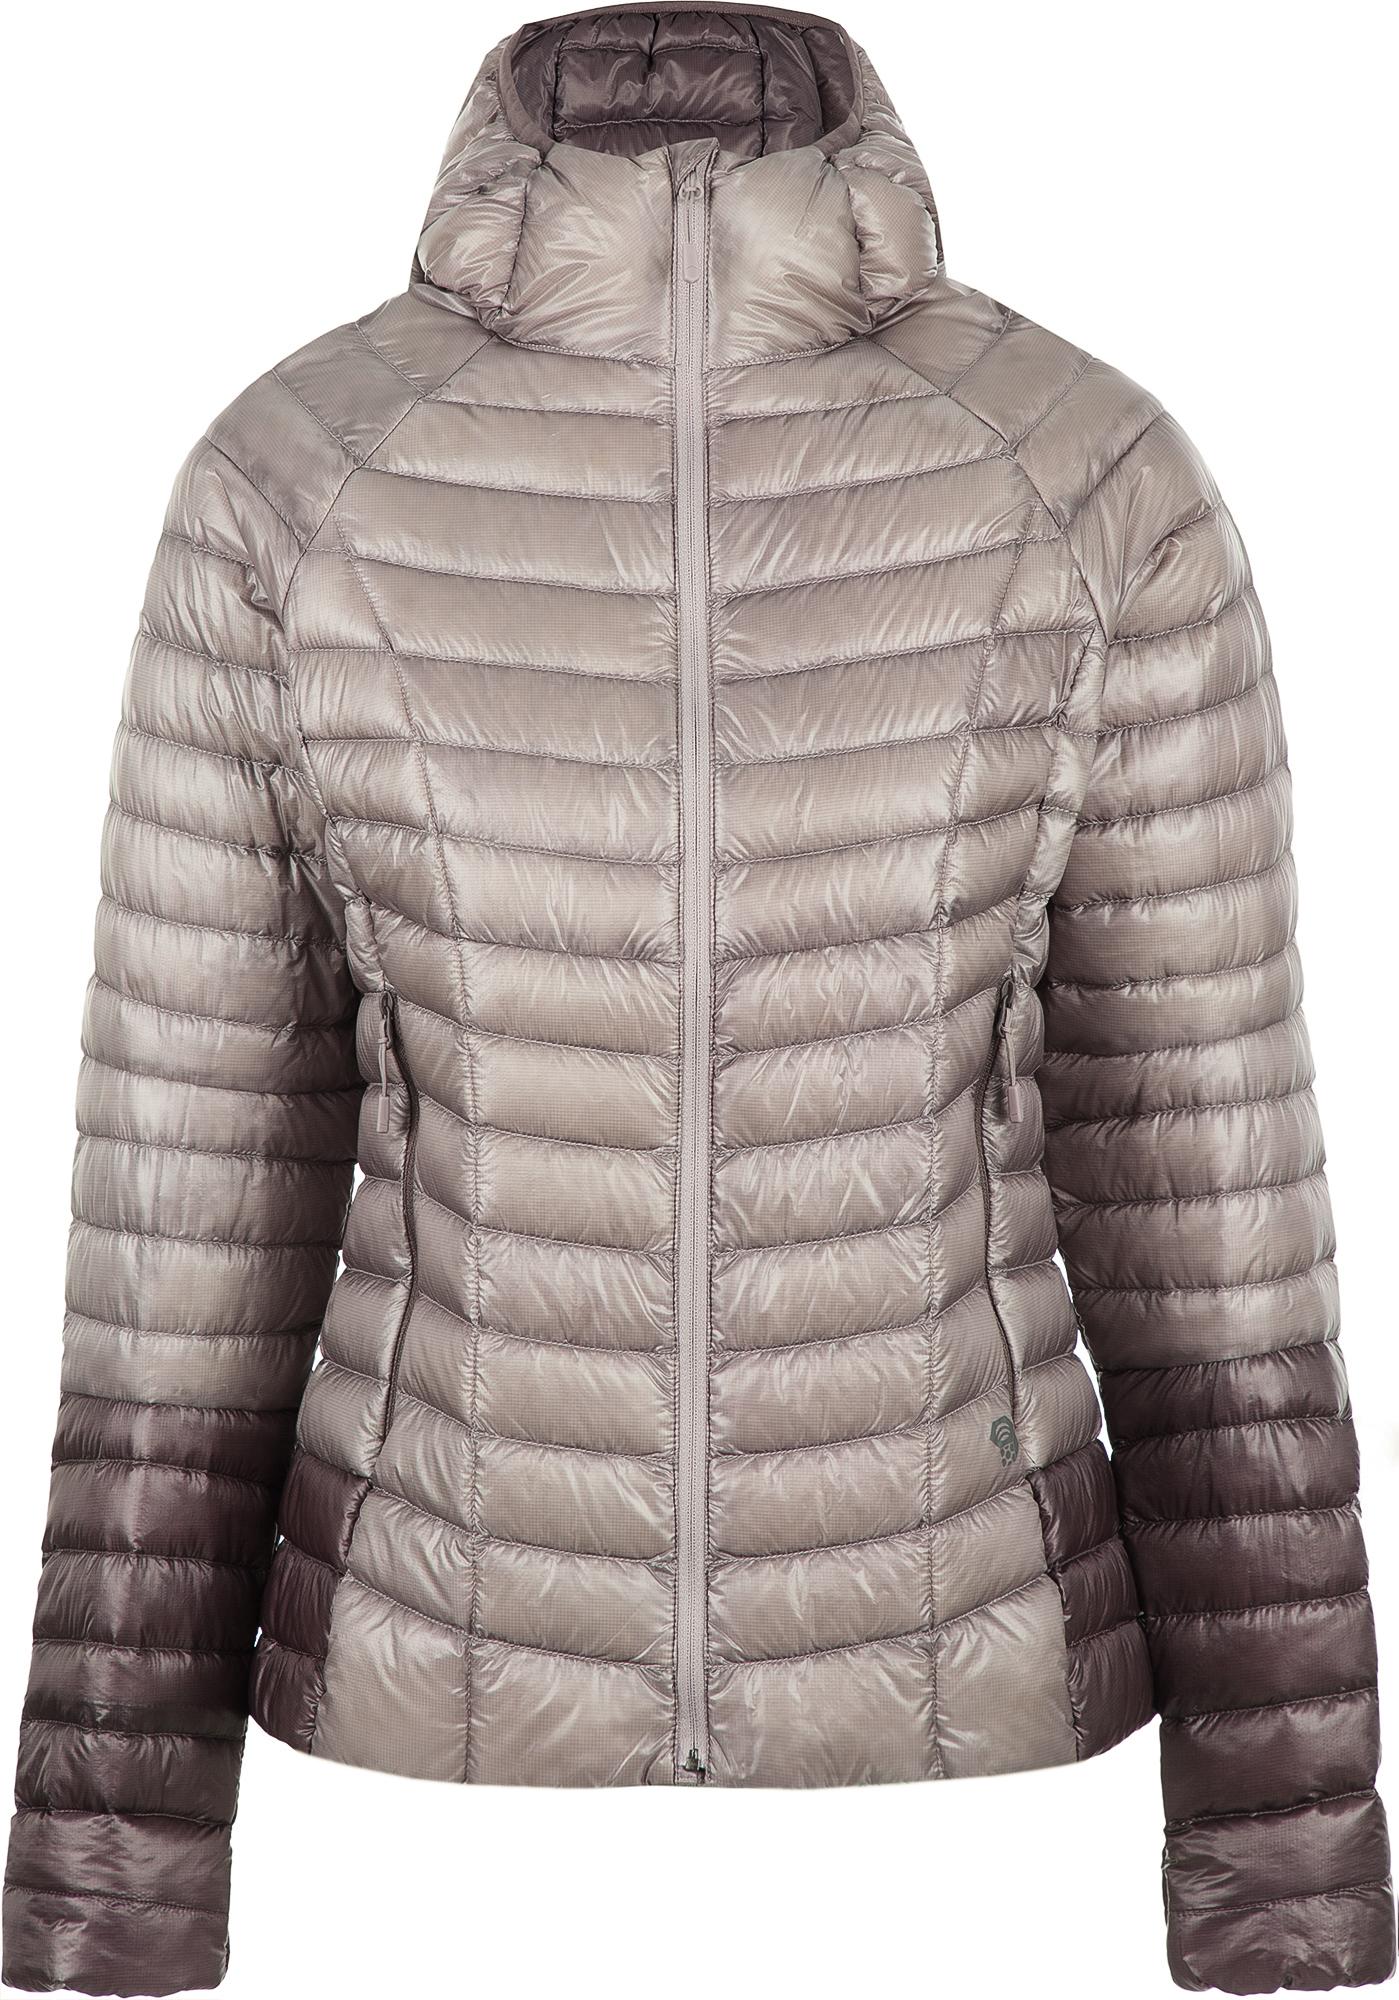 Mountain Hardwear Куртка пуховая женская Mountain Hardwear Ghost Whisperer/2™, размер 50 the elephant whisperer